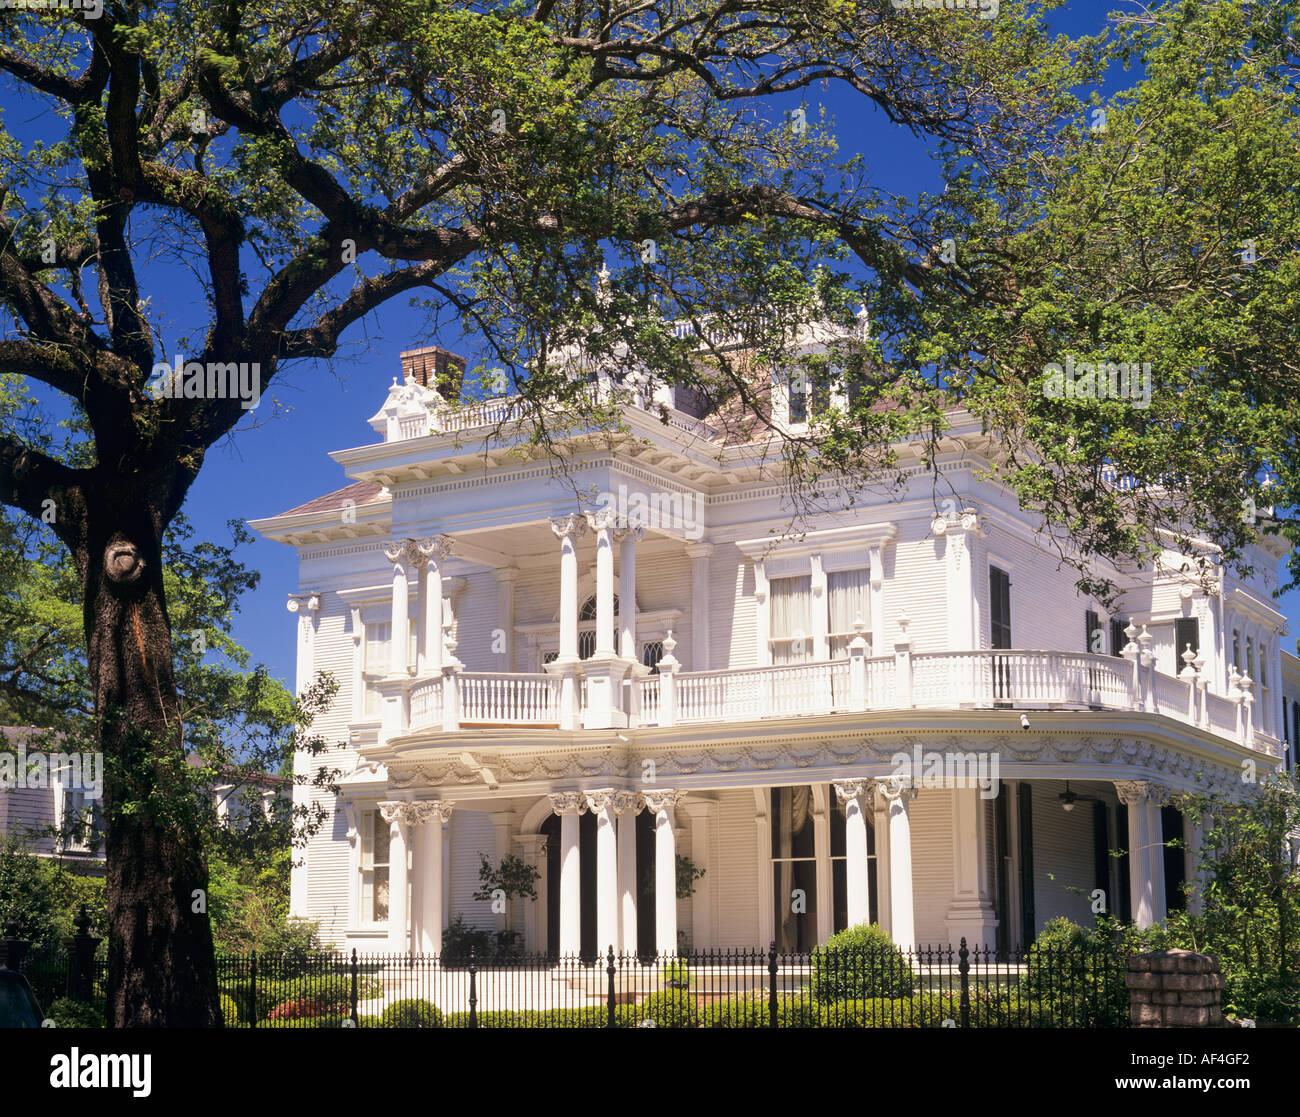 The Wedding Cake House St Charles Avenue New Orleans Louisiana USA